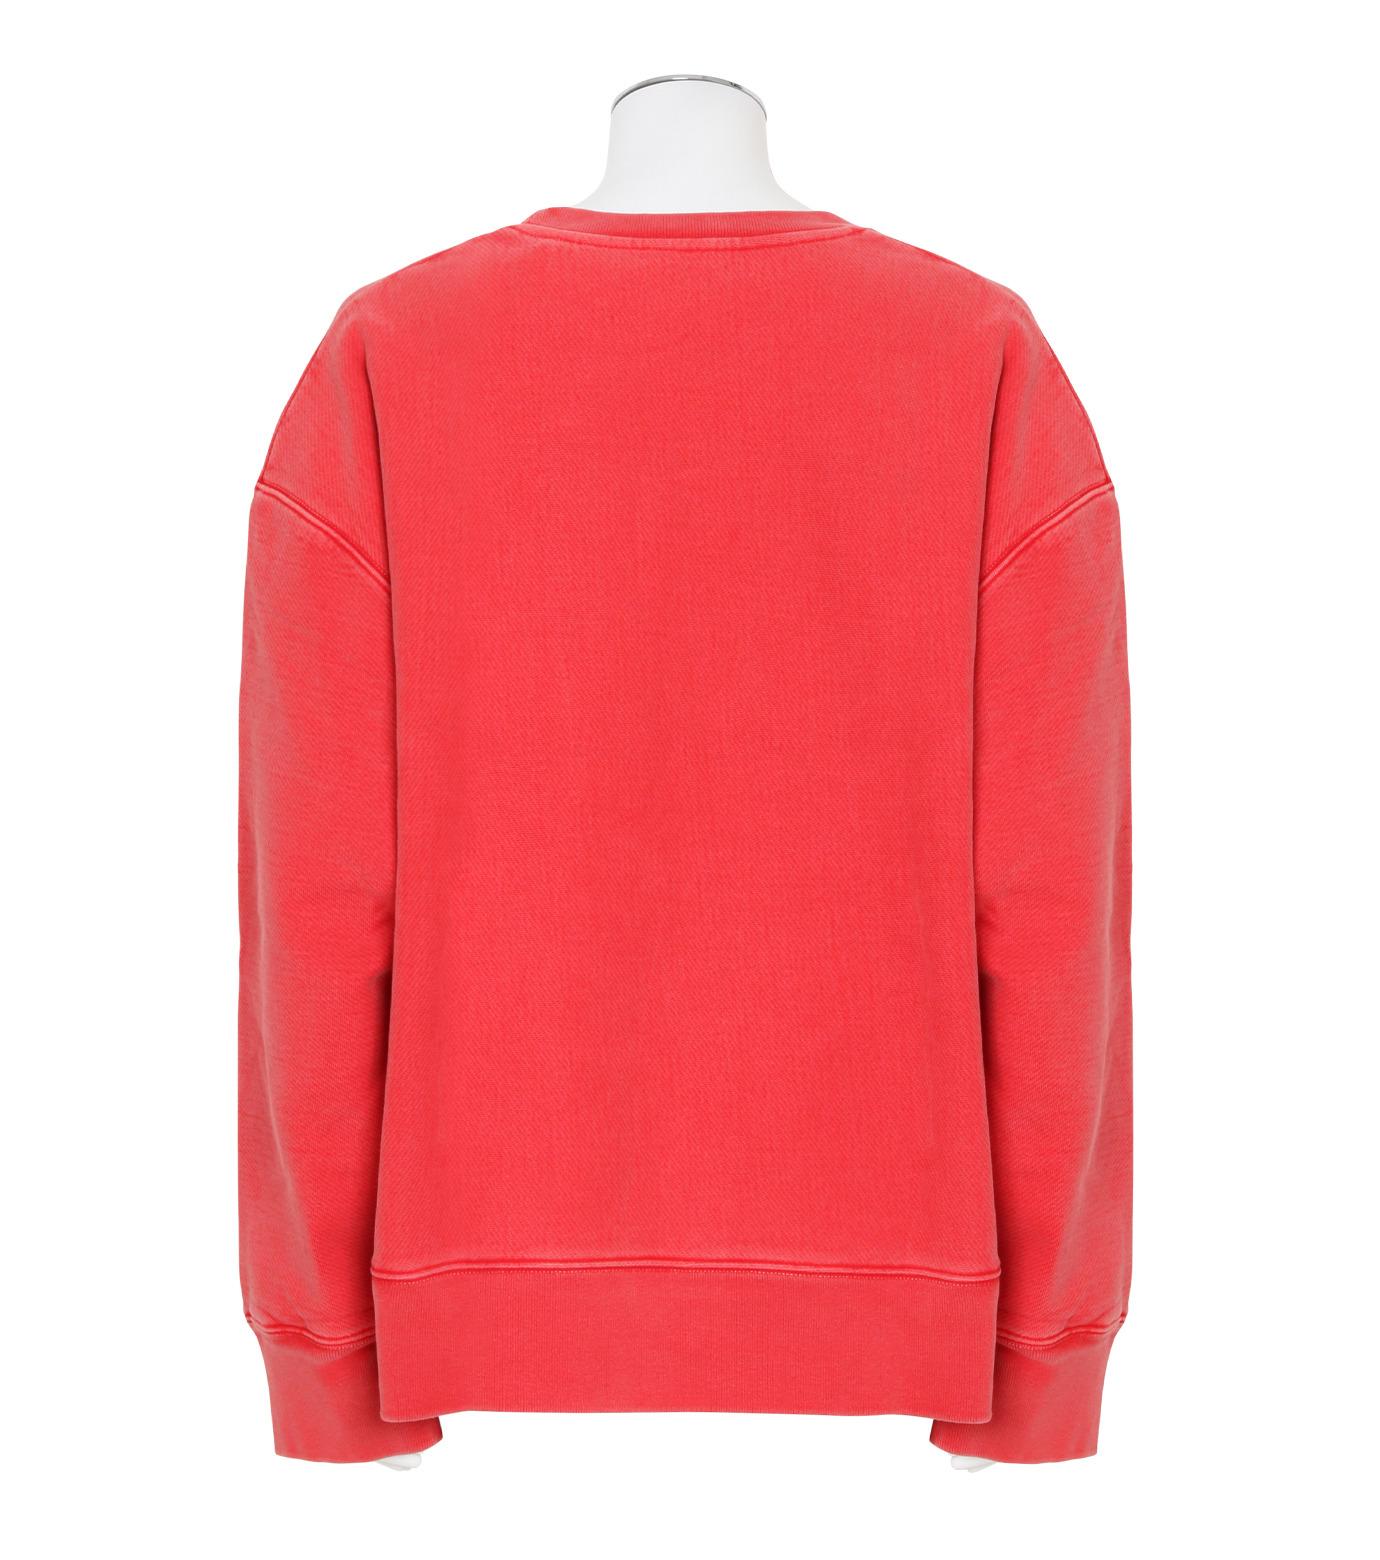 YEEZY(イージー)のCREWNECK SWEATSHIRT-RED(カットソー/cut and sewn)-KW3M209-107-62 拡大詳細画像2